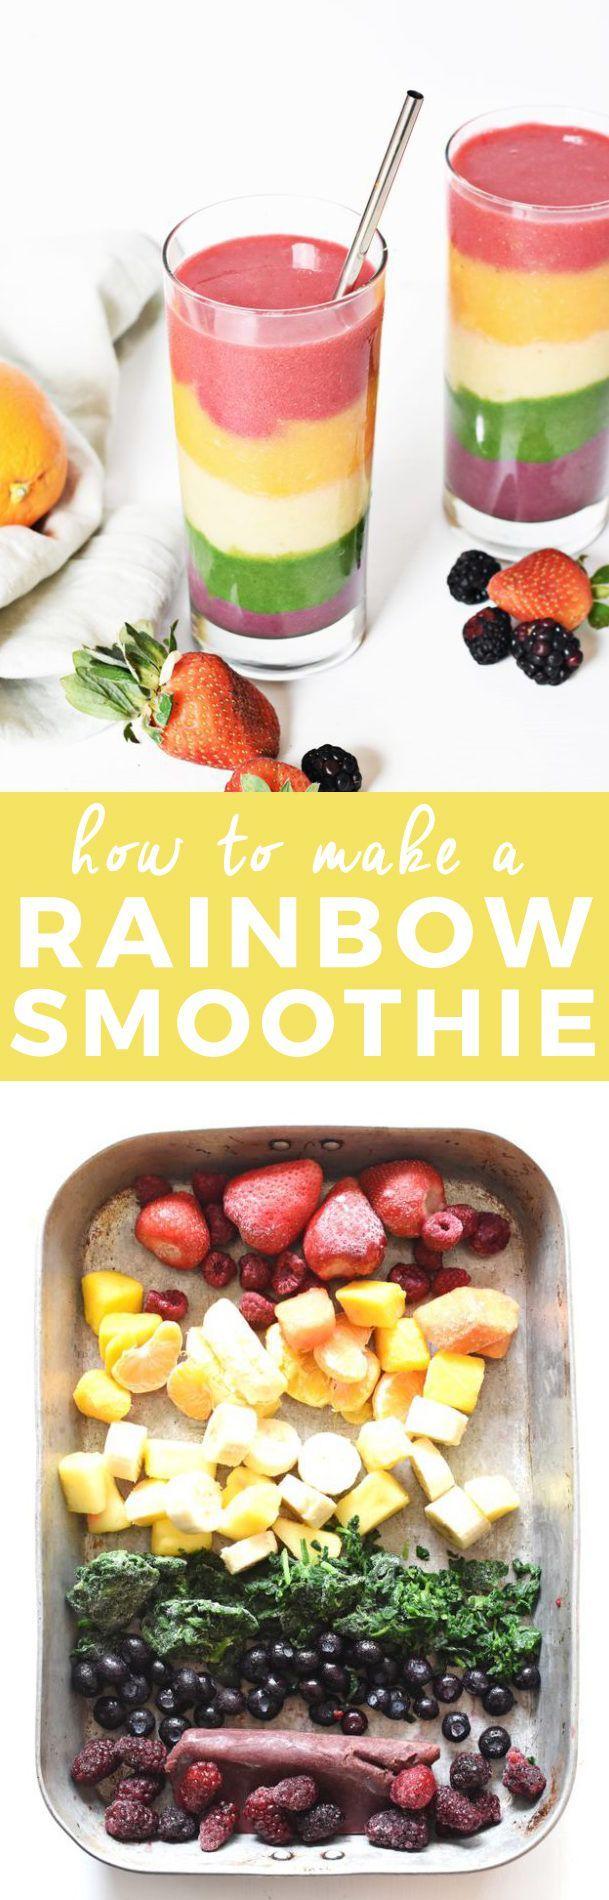 How to Make a Rainbow Smoothie | homemade smoothie recipes, smoothie recipe ideas, healthy smoothie recipes, fruit smoothie recipes, smoothie recipes, how to make a smoothie, smoothie recipe ideas || The Butter Half via @thebutterhalf